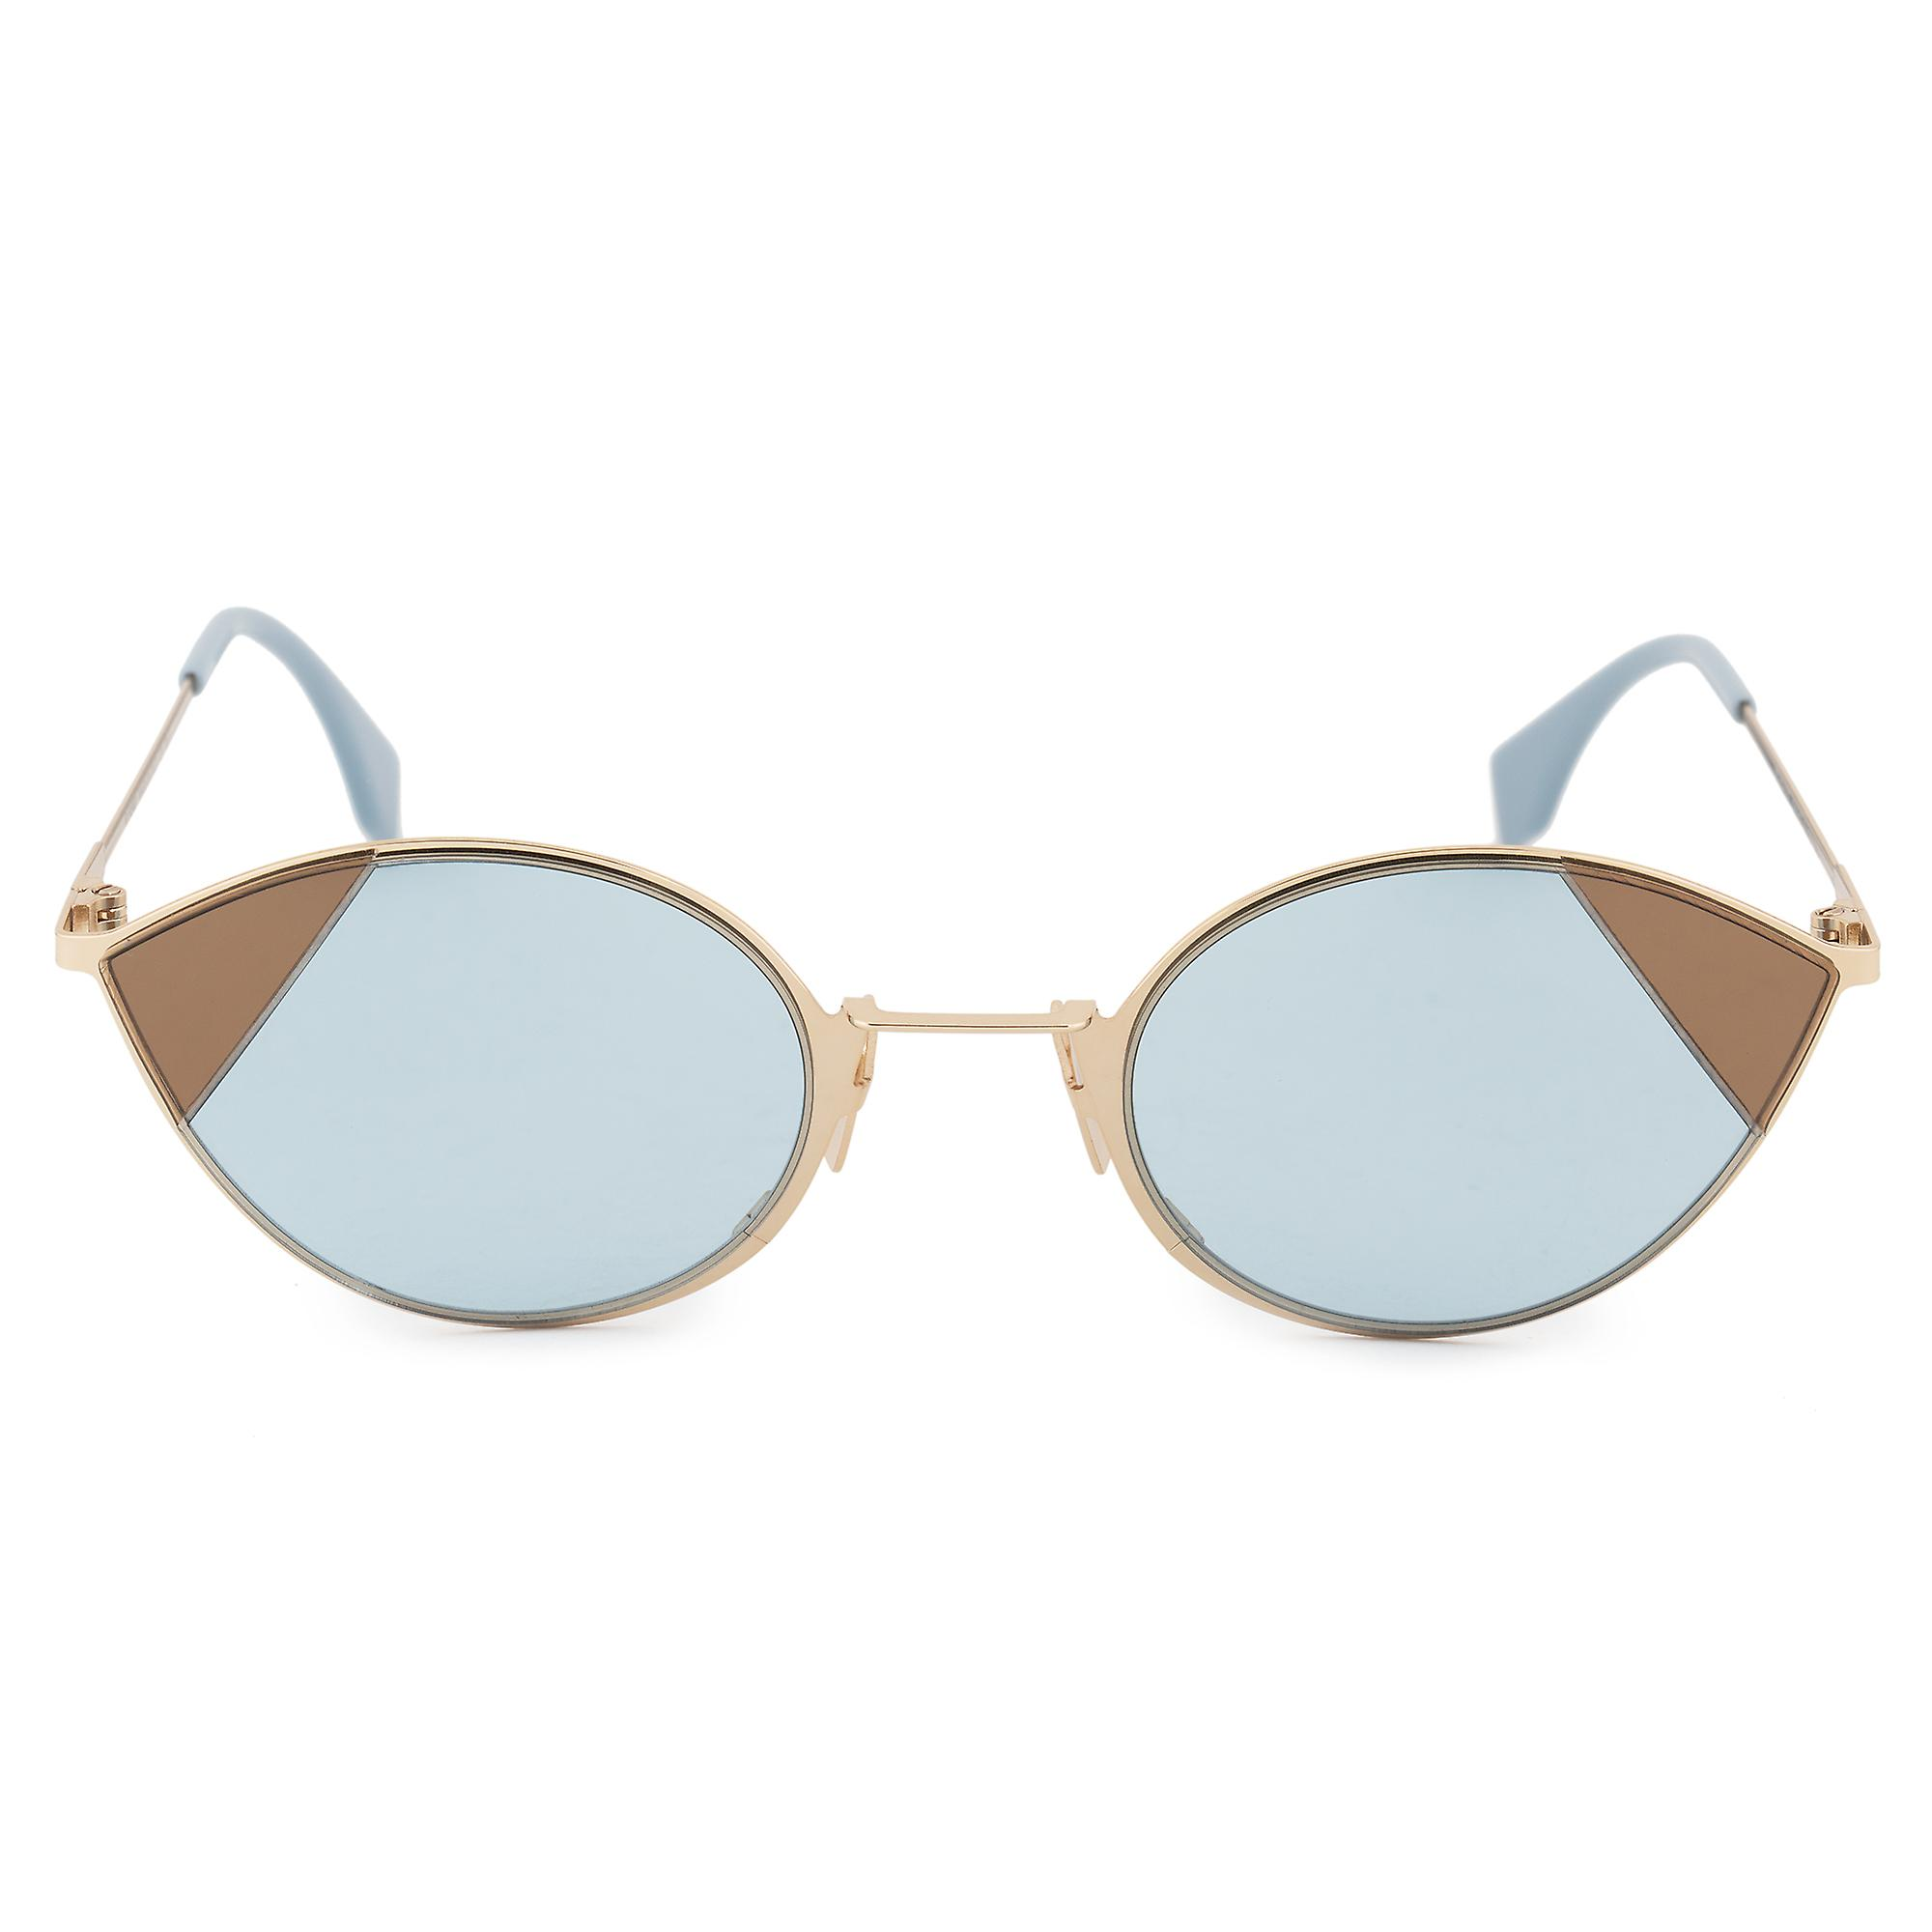 Fendi Cut-Eye FF 0342 S QWU 1P 51 Cat Eye Sunglasses